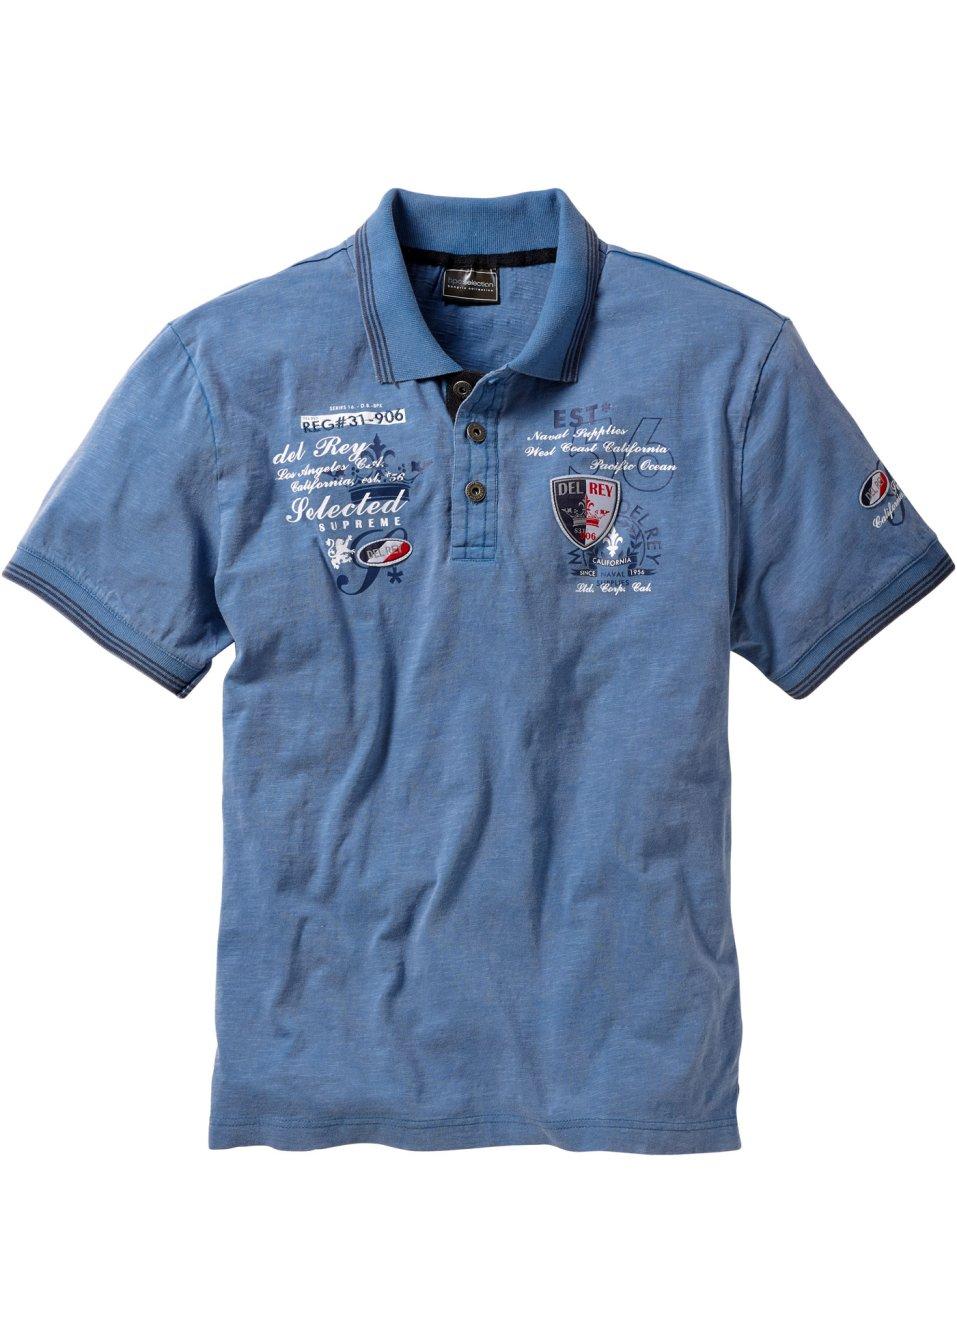 Poloshirt mit aufwendiger Verzierung - jeansblau NuSuH hh06E